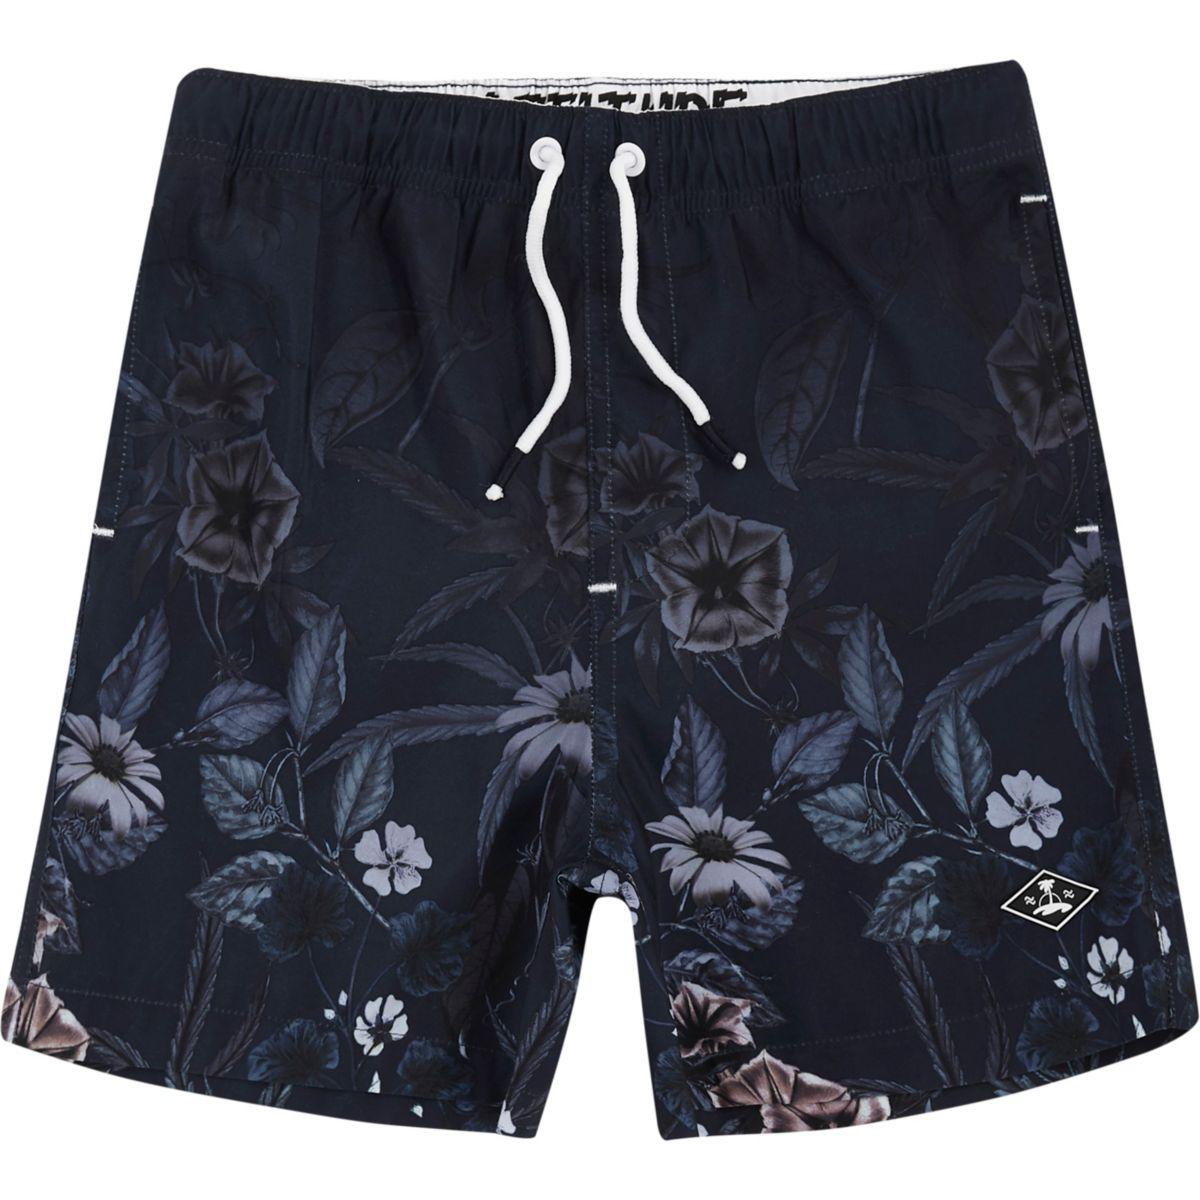 Boys navy floral fade print swim trunks